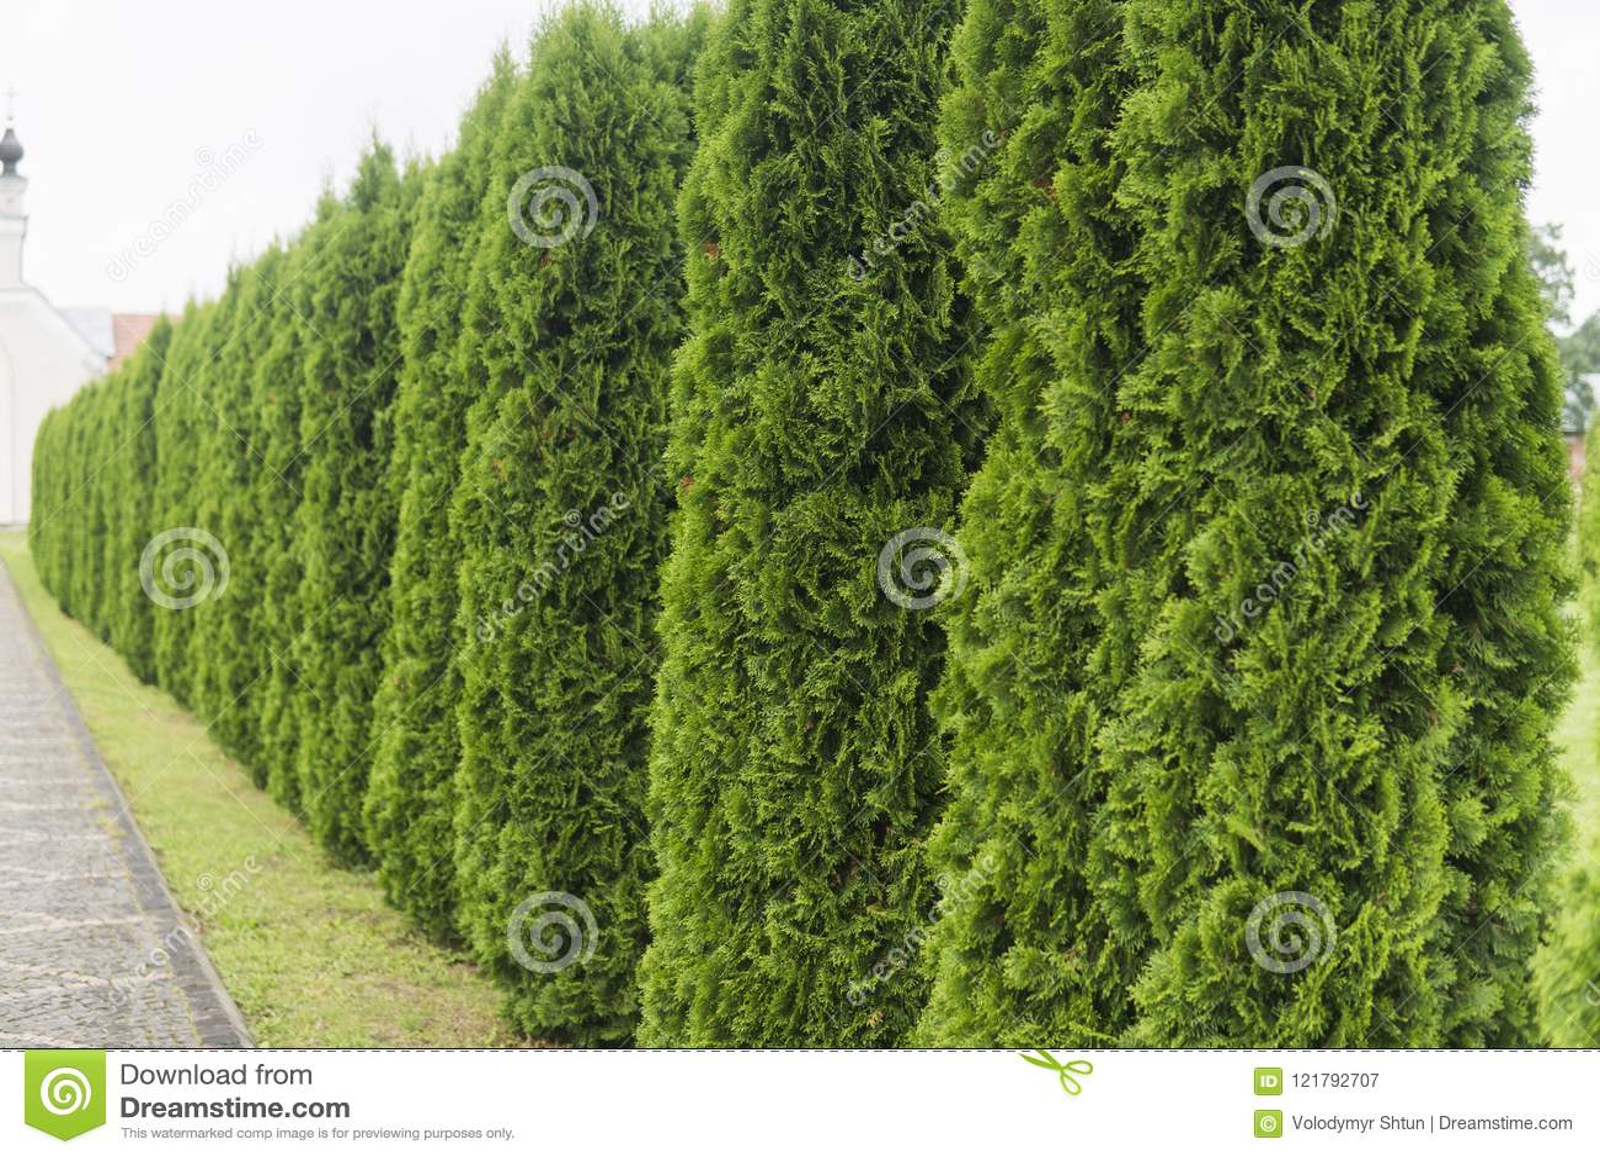 green hedge of thuja trees green hedge of the tui tree nature